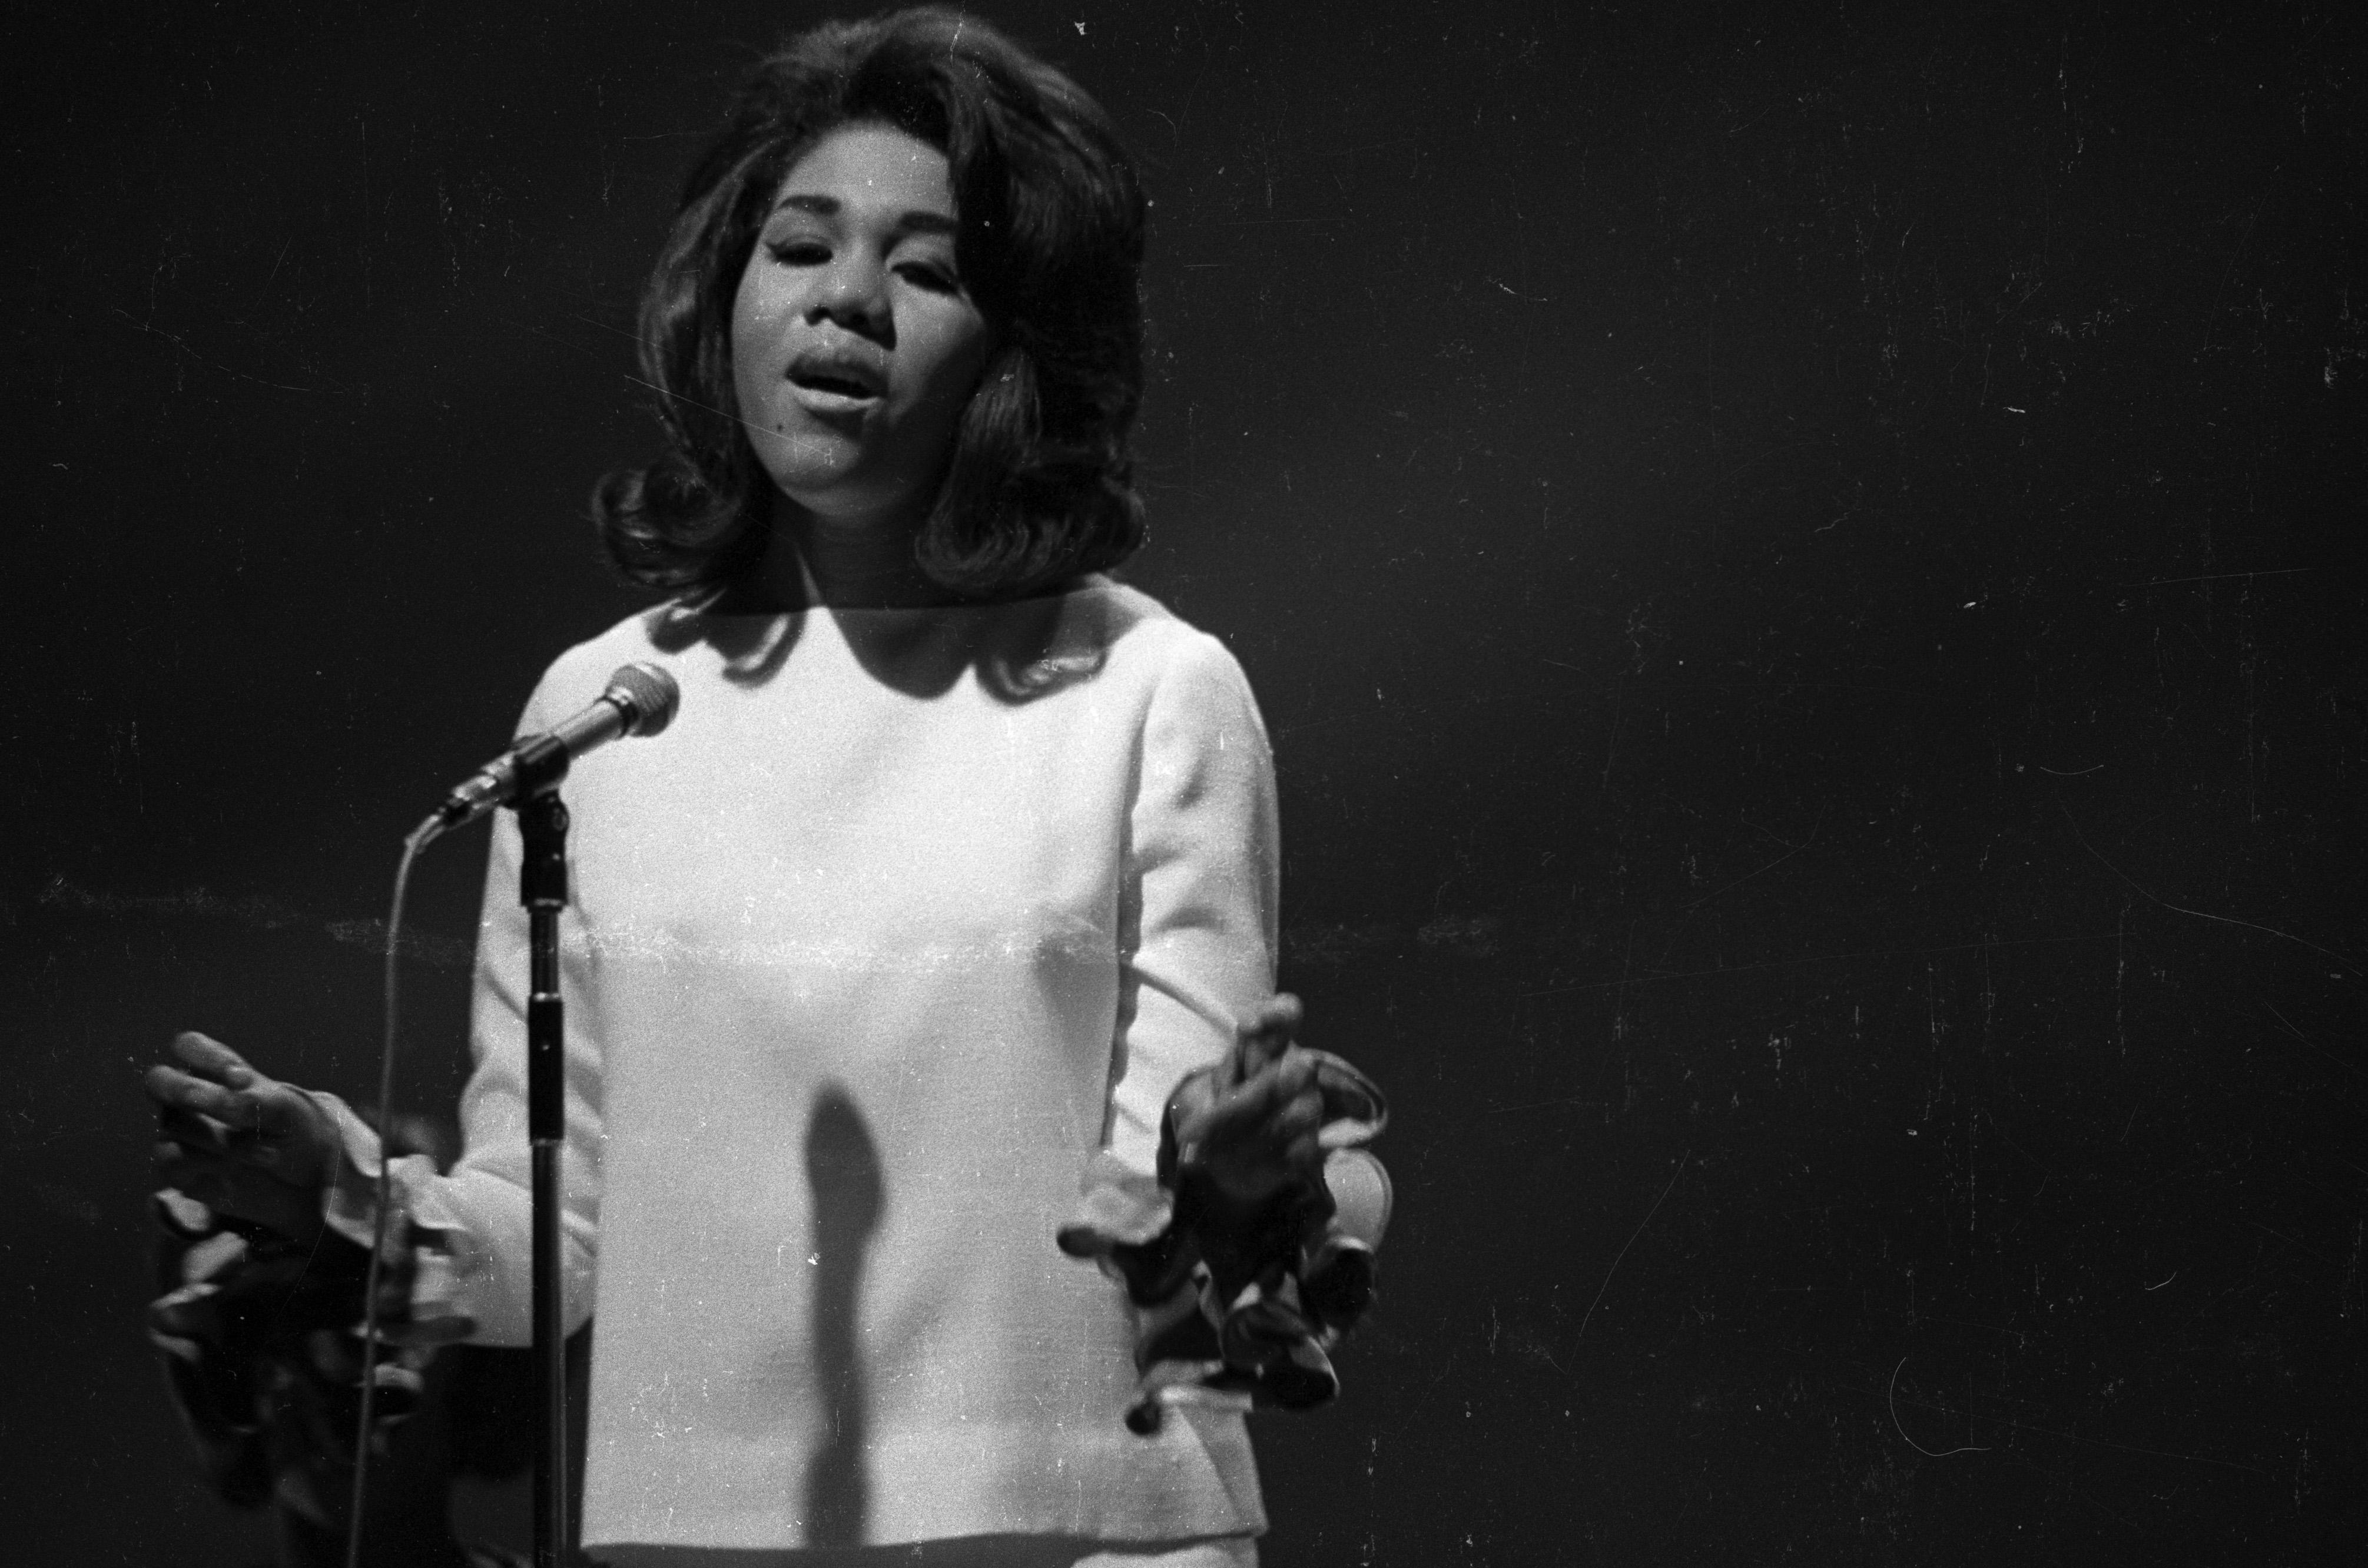 Backing singer, Clydie King singing on stage